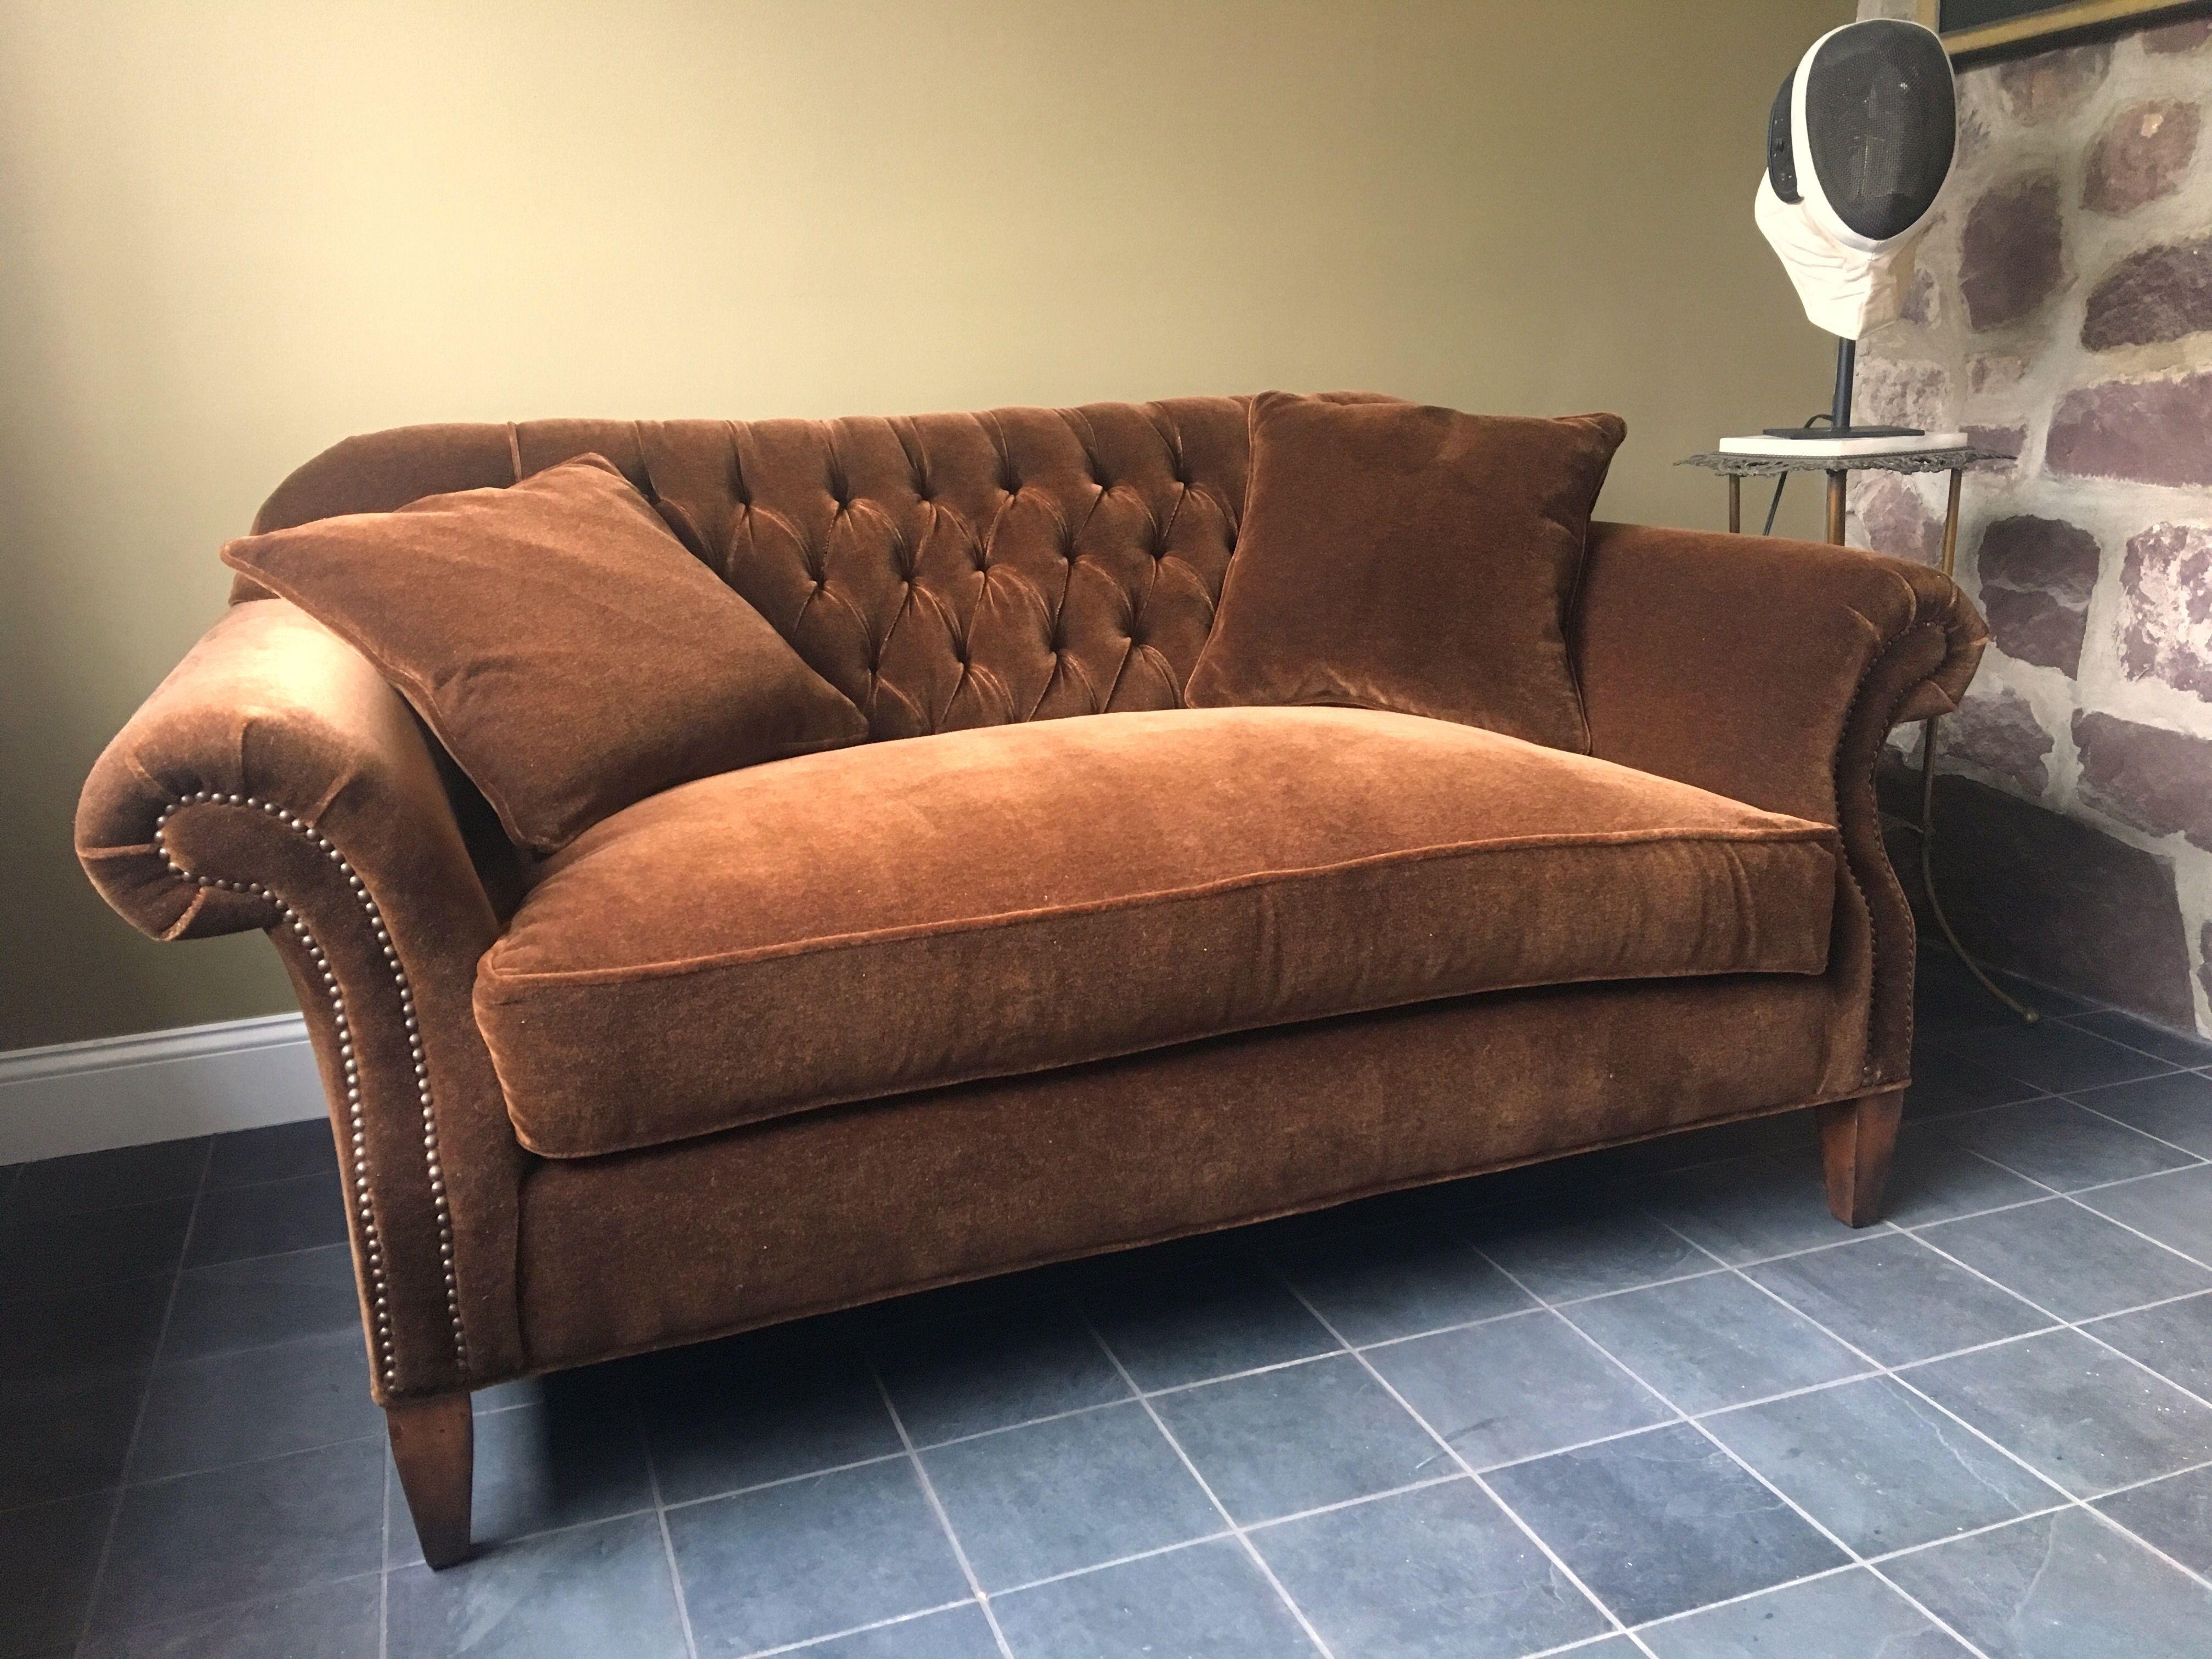 Expertly Upholstered In Espresso Mohair Velvet American Made Furniture